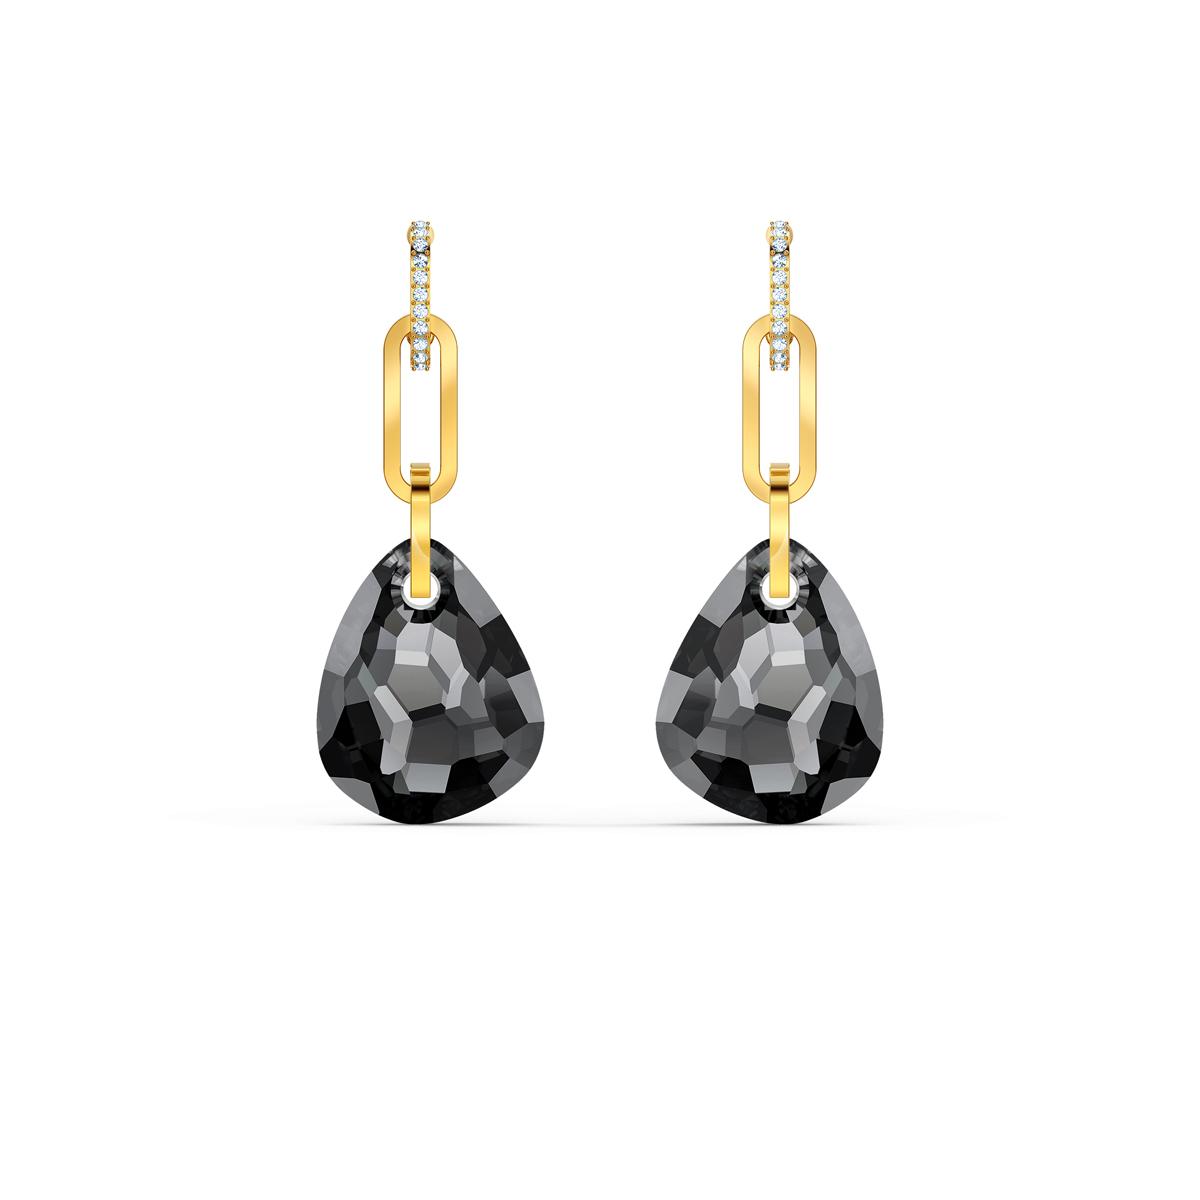 Swarovski T Bar Pierced Earrings, Medium, Gray, Gold Tone Plated